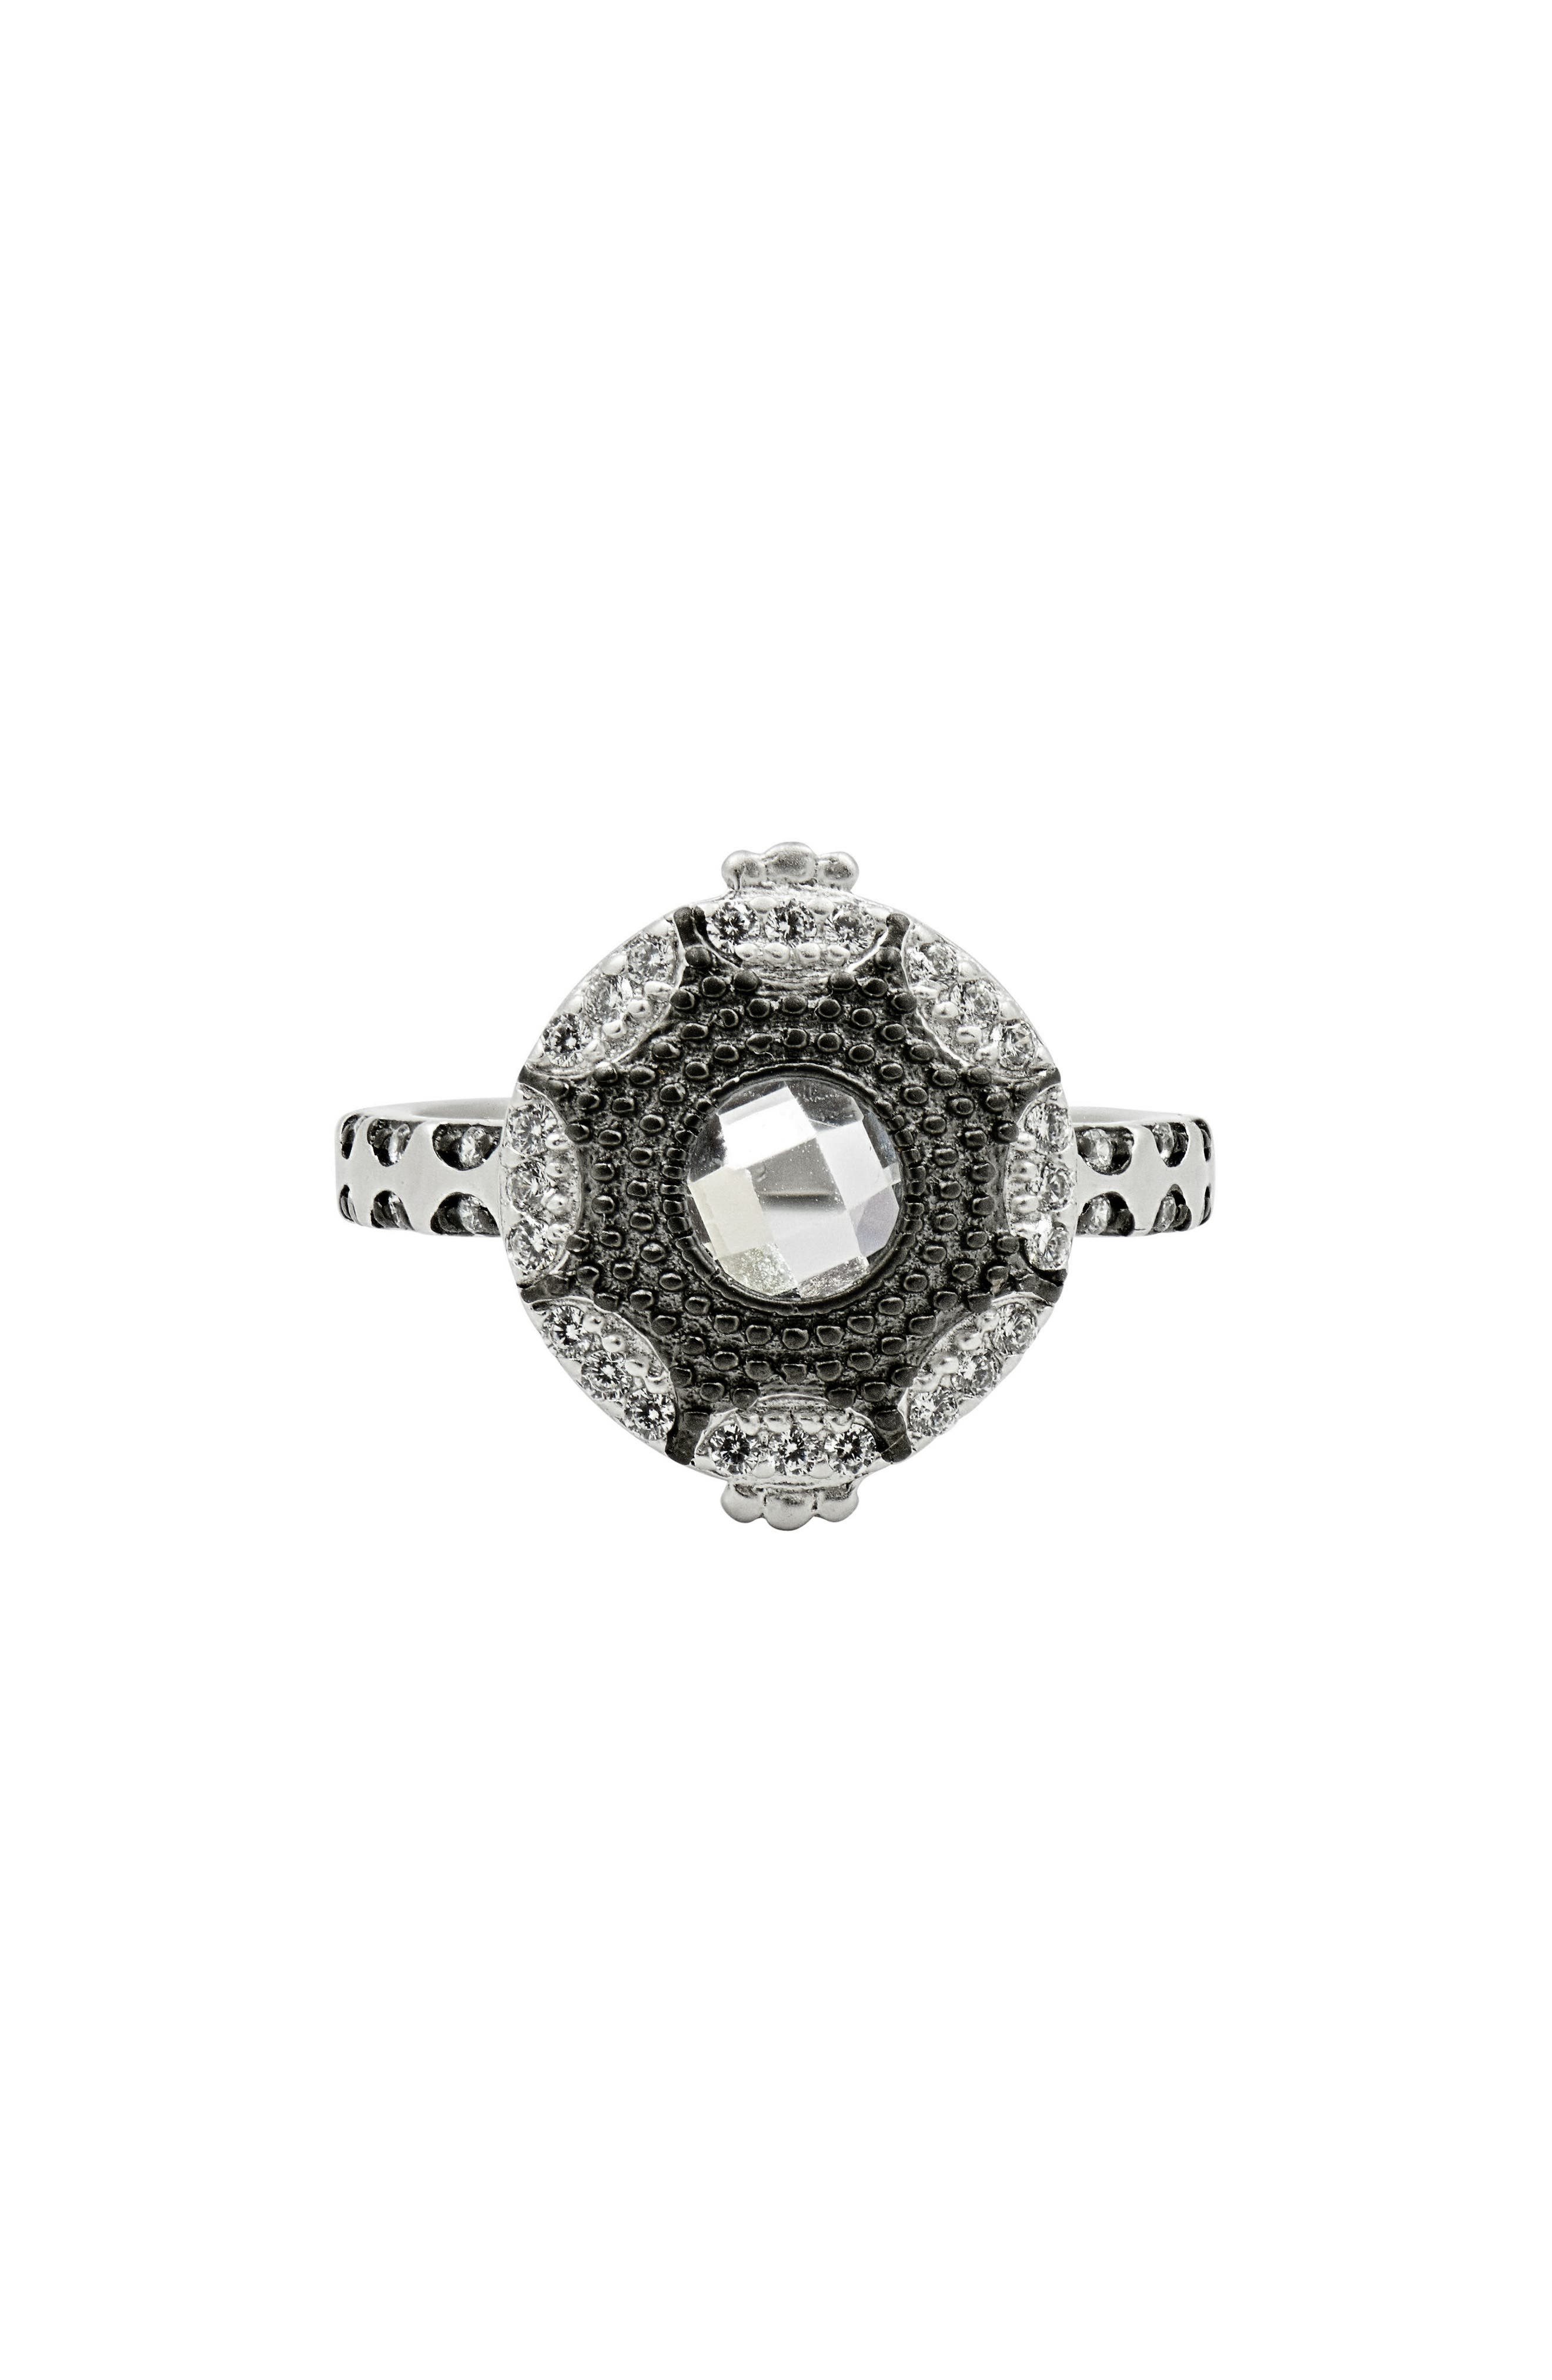 FREIDA ROTHMAN Signature Starburst Ring